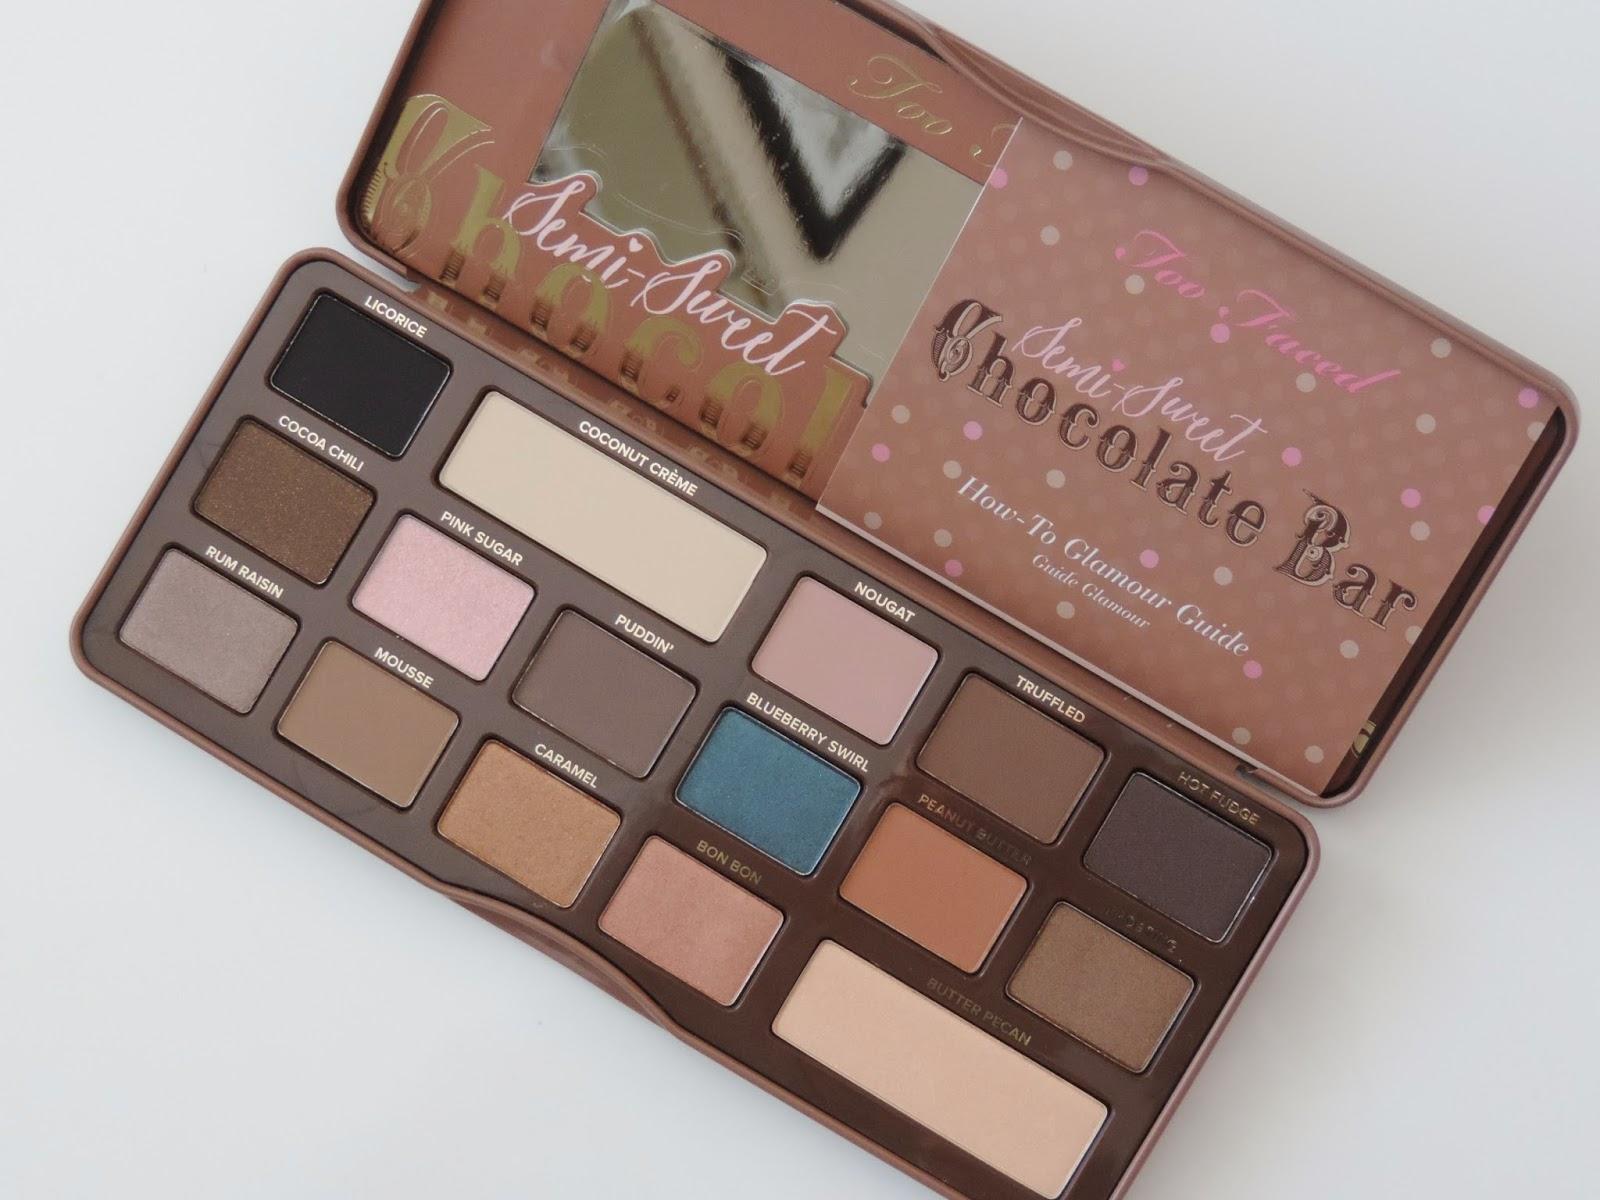 Leona's Looks: Too Faced Semi Sweet Chocolate Bar palette